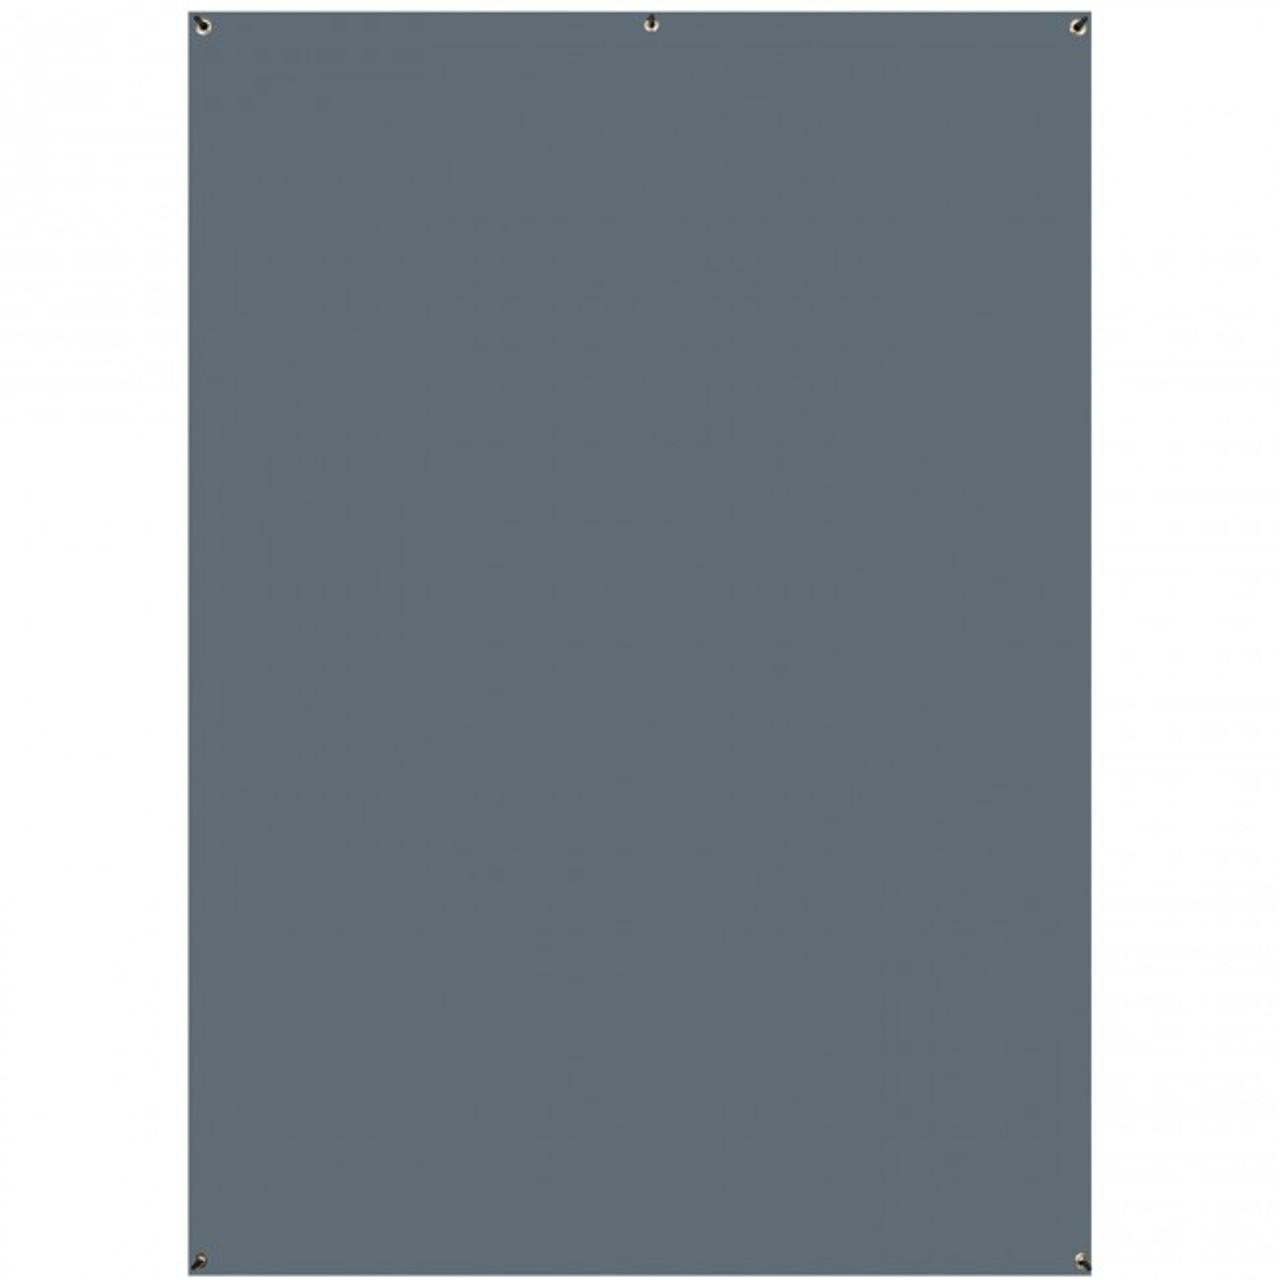 Westcott X-Drop Wrinkle-Resistant Backdrop - Neutral Gray 5' x 7'